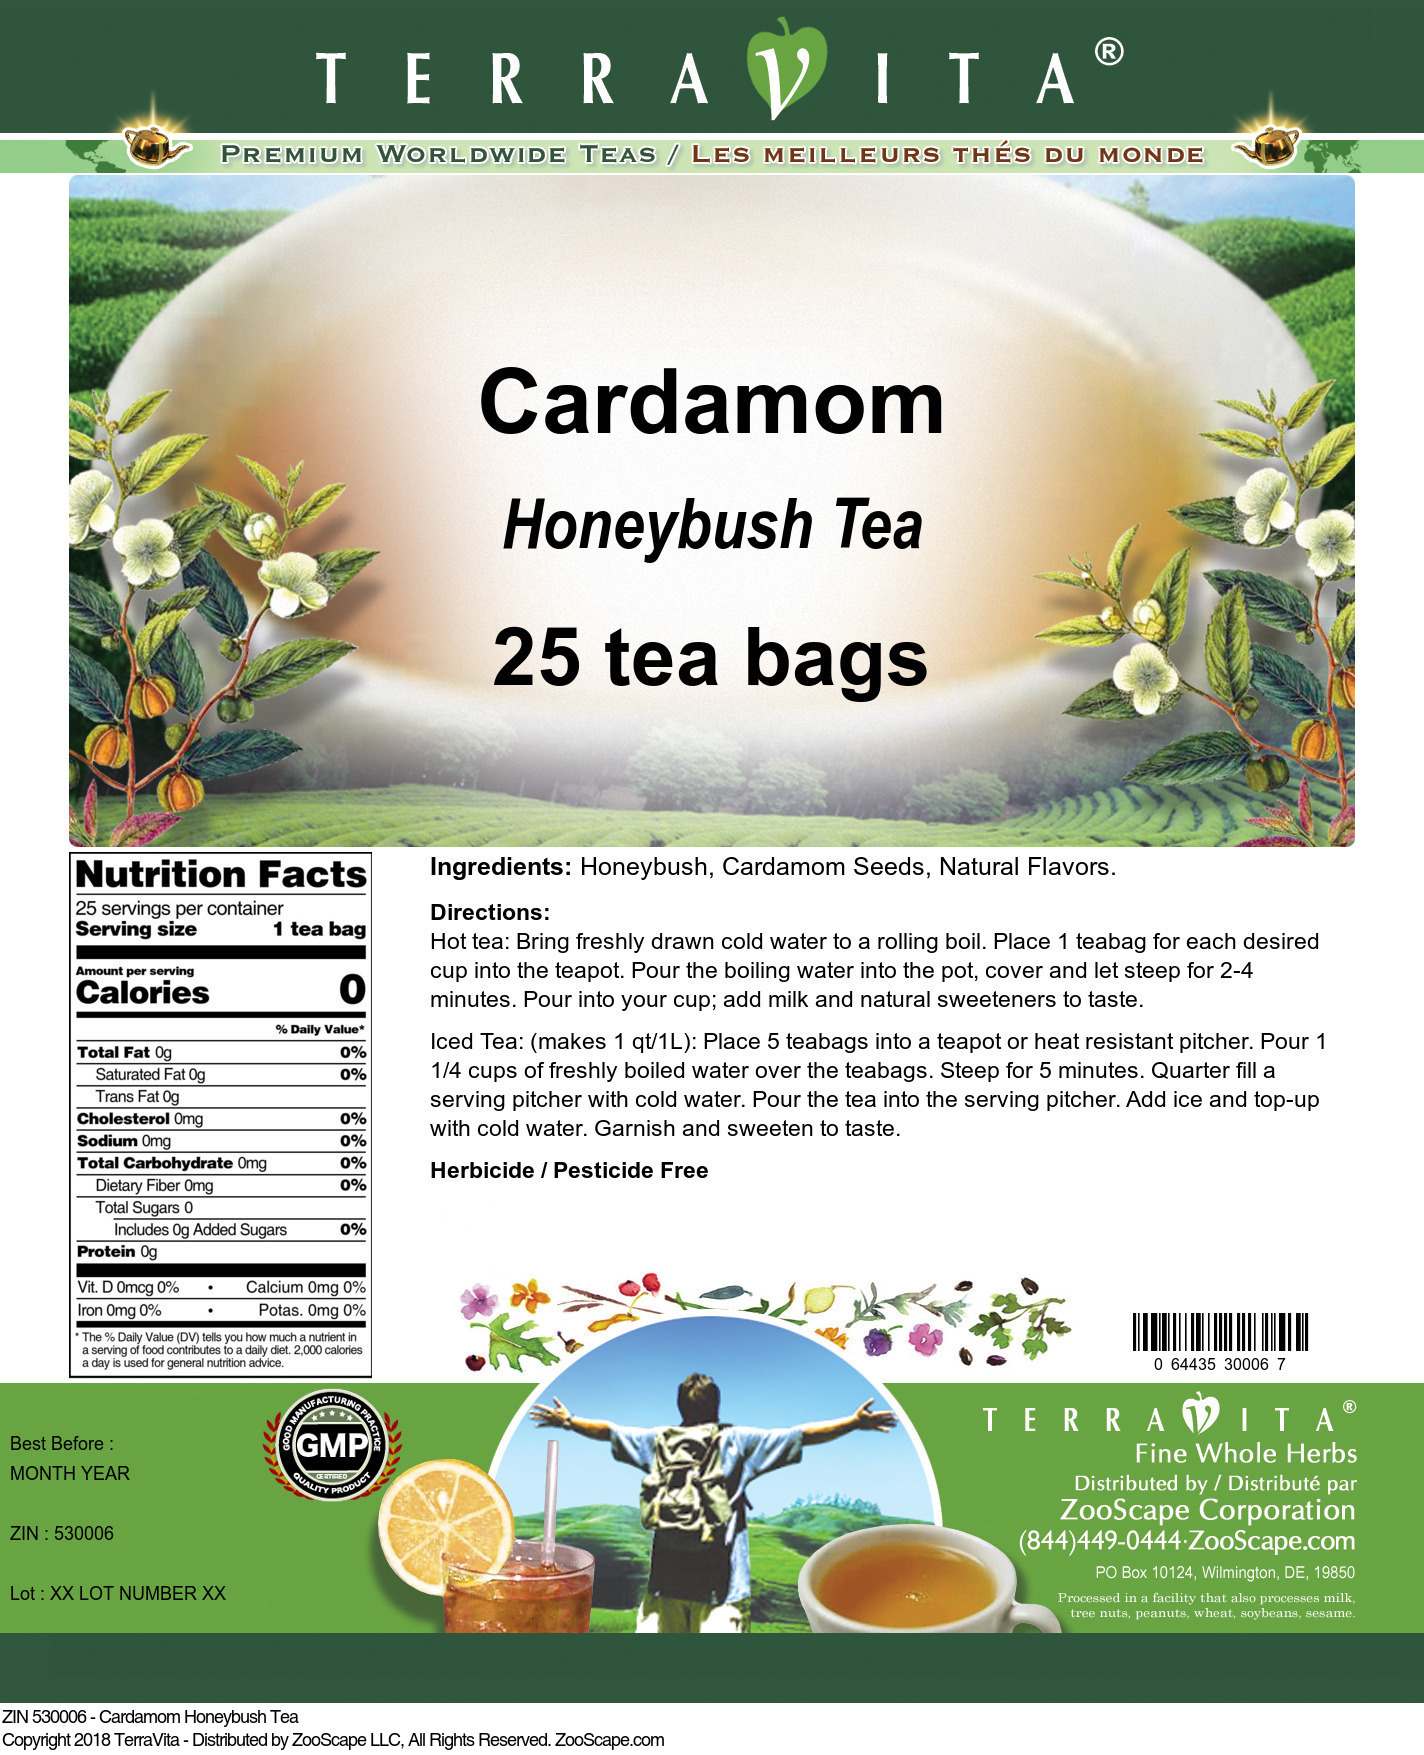 Cardamom Honeybush Tea